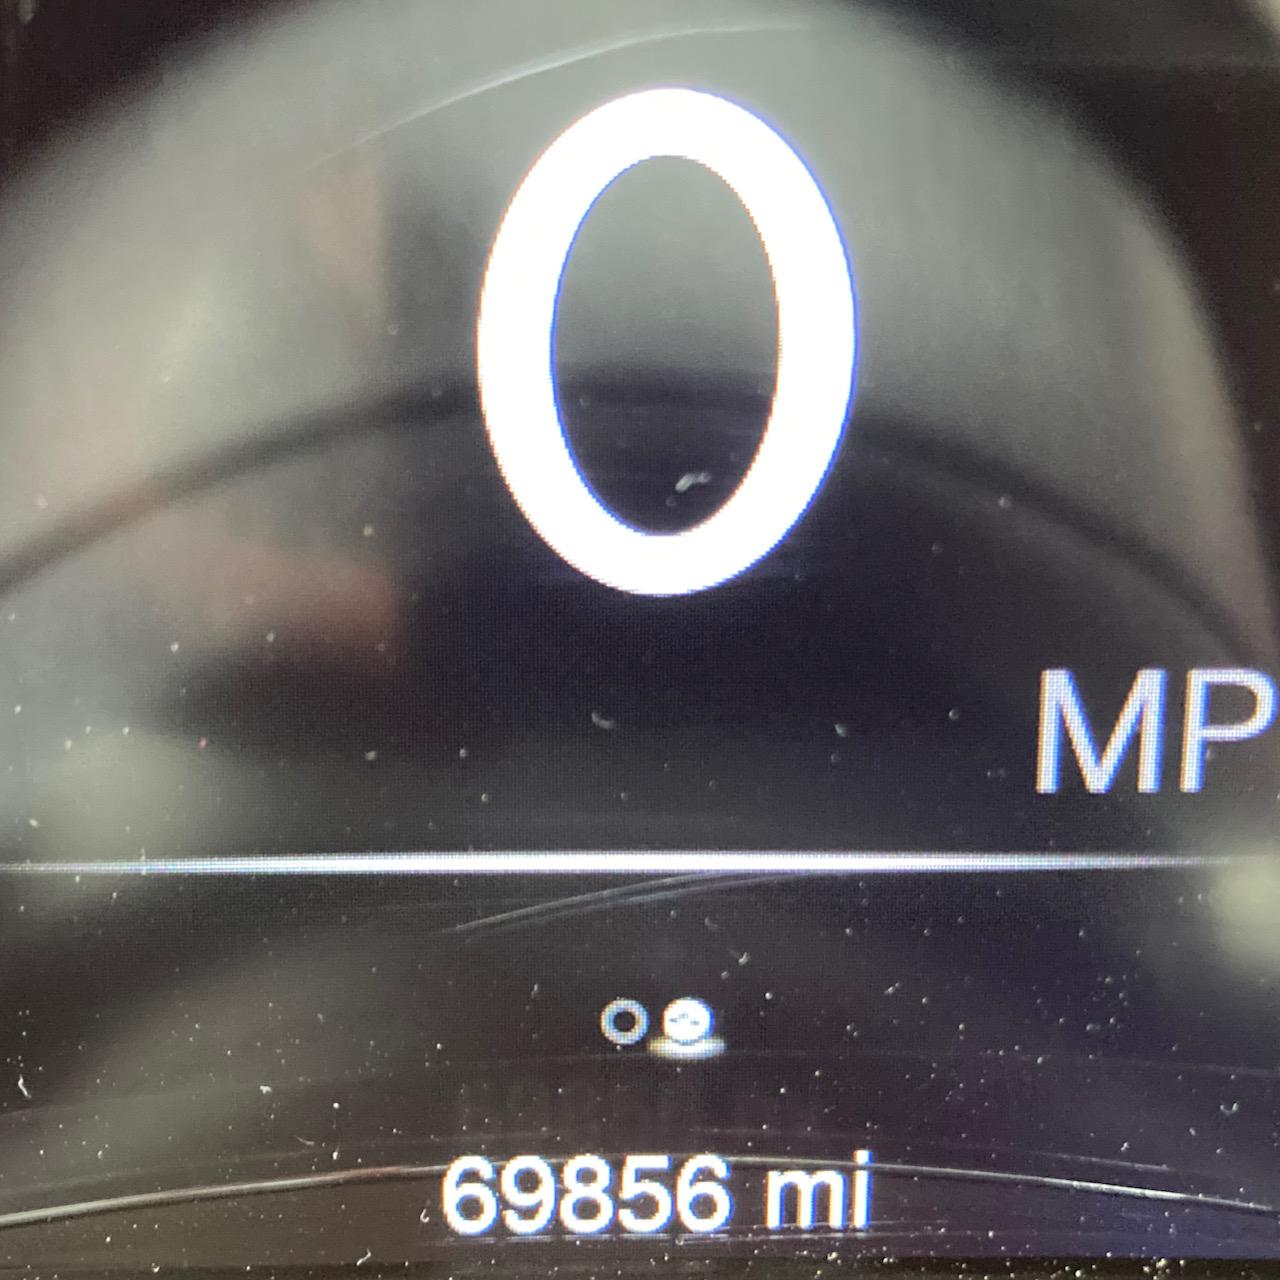 Car odometer reading 69856 miles.